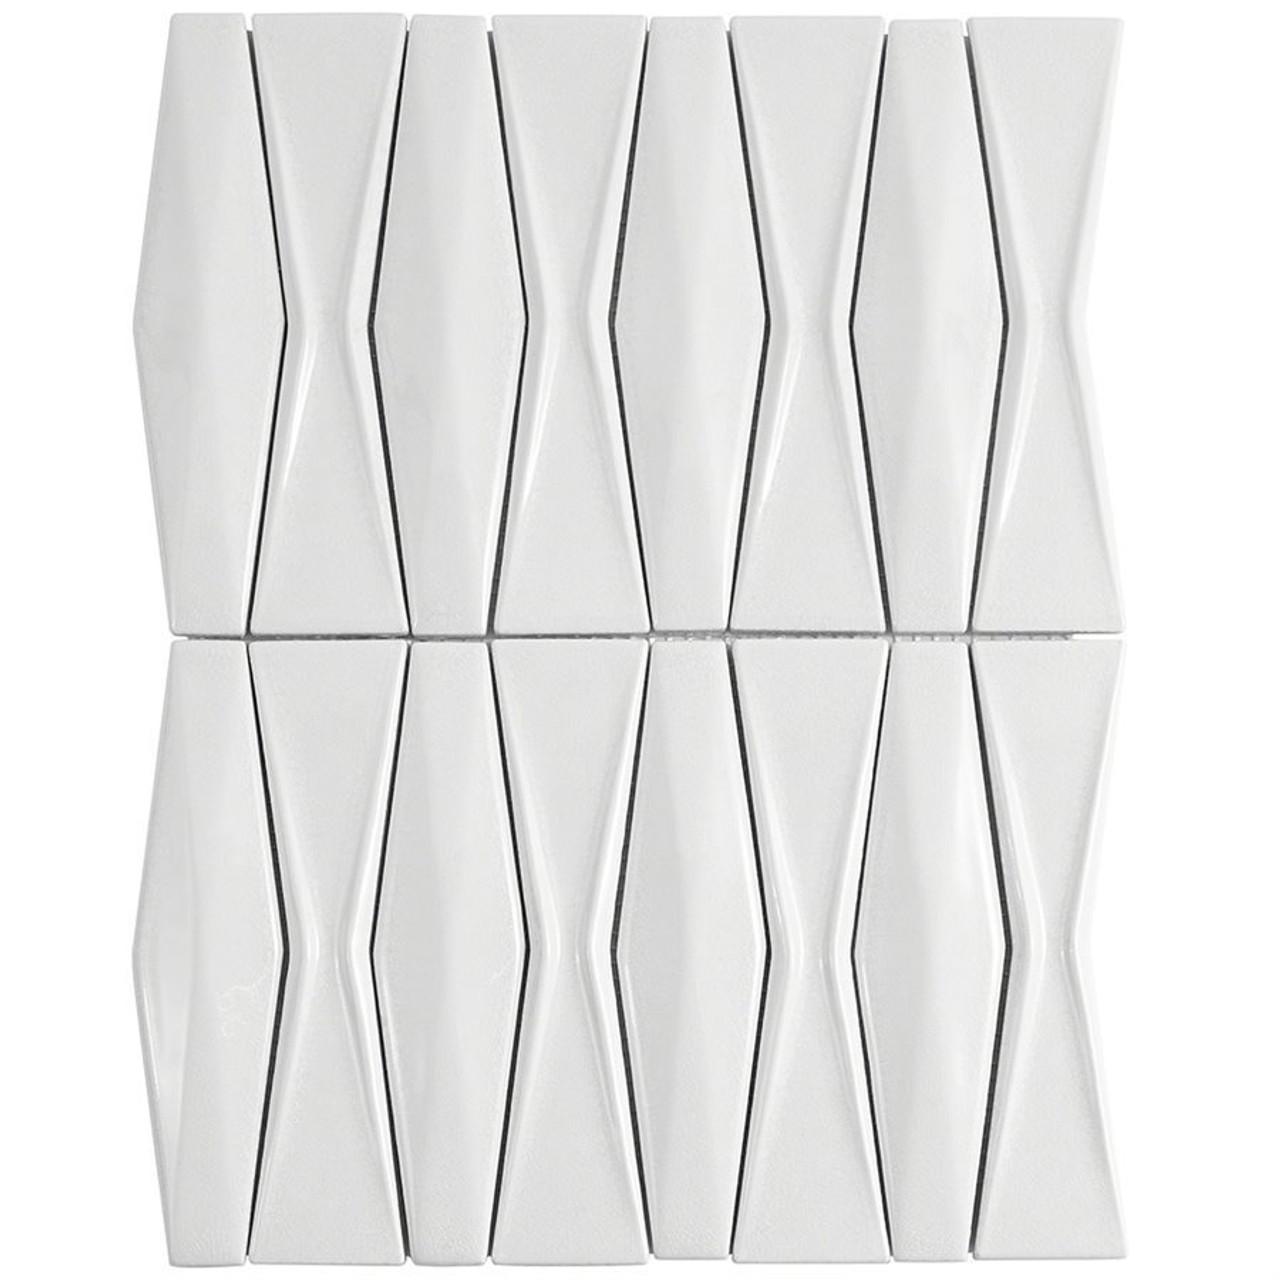 Soho Studio Baroque Adwick Blanco Ceramic Tile Mosaic